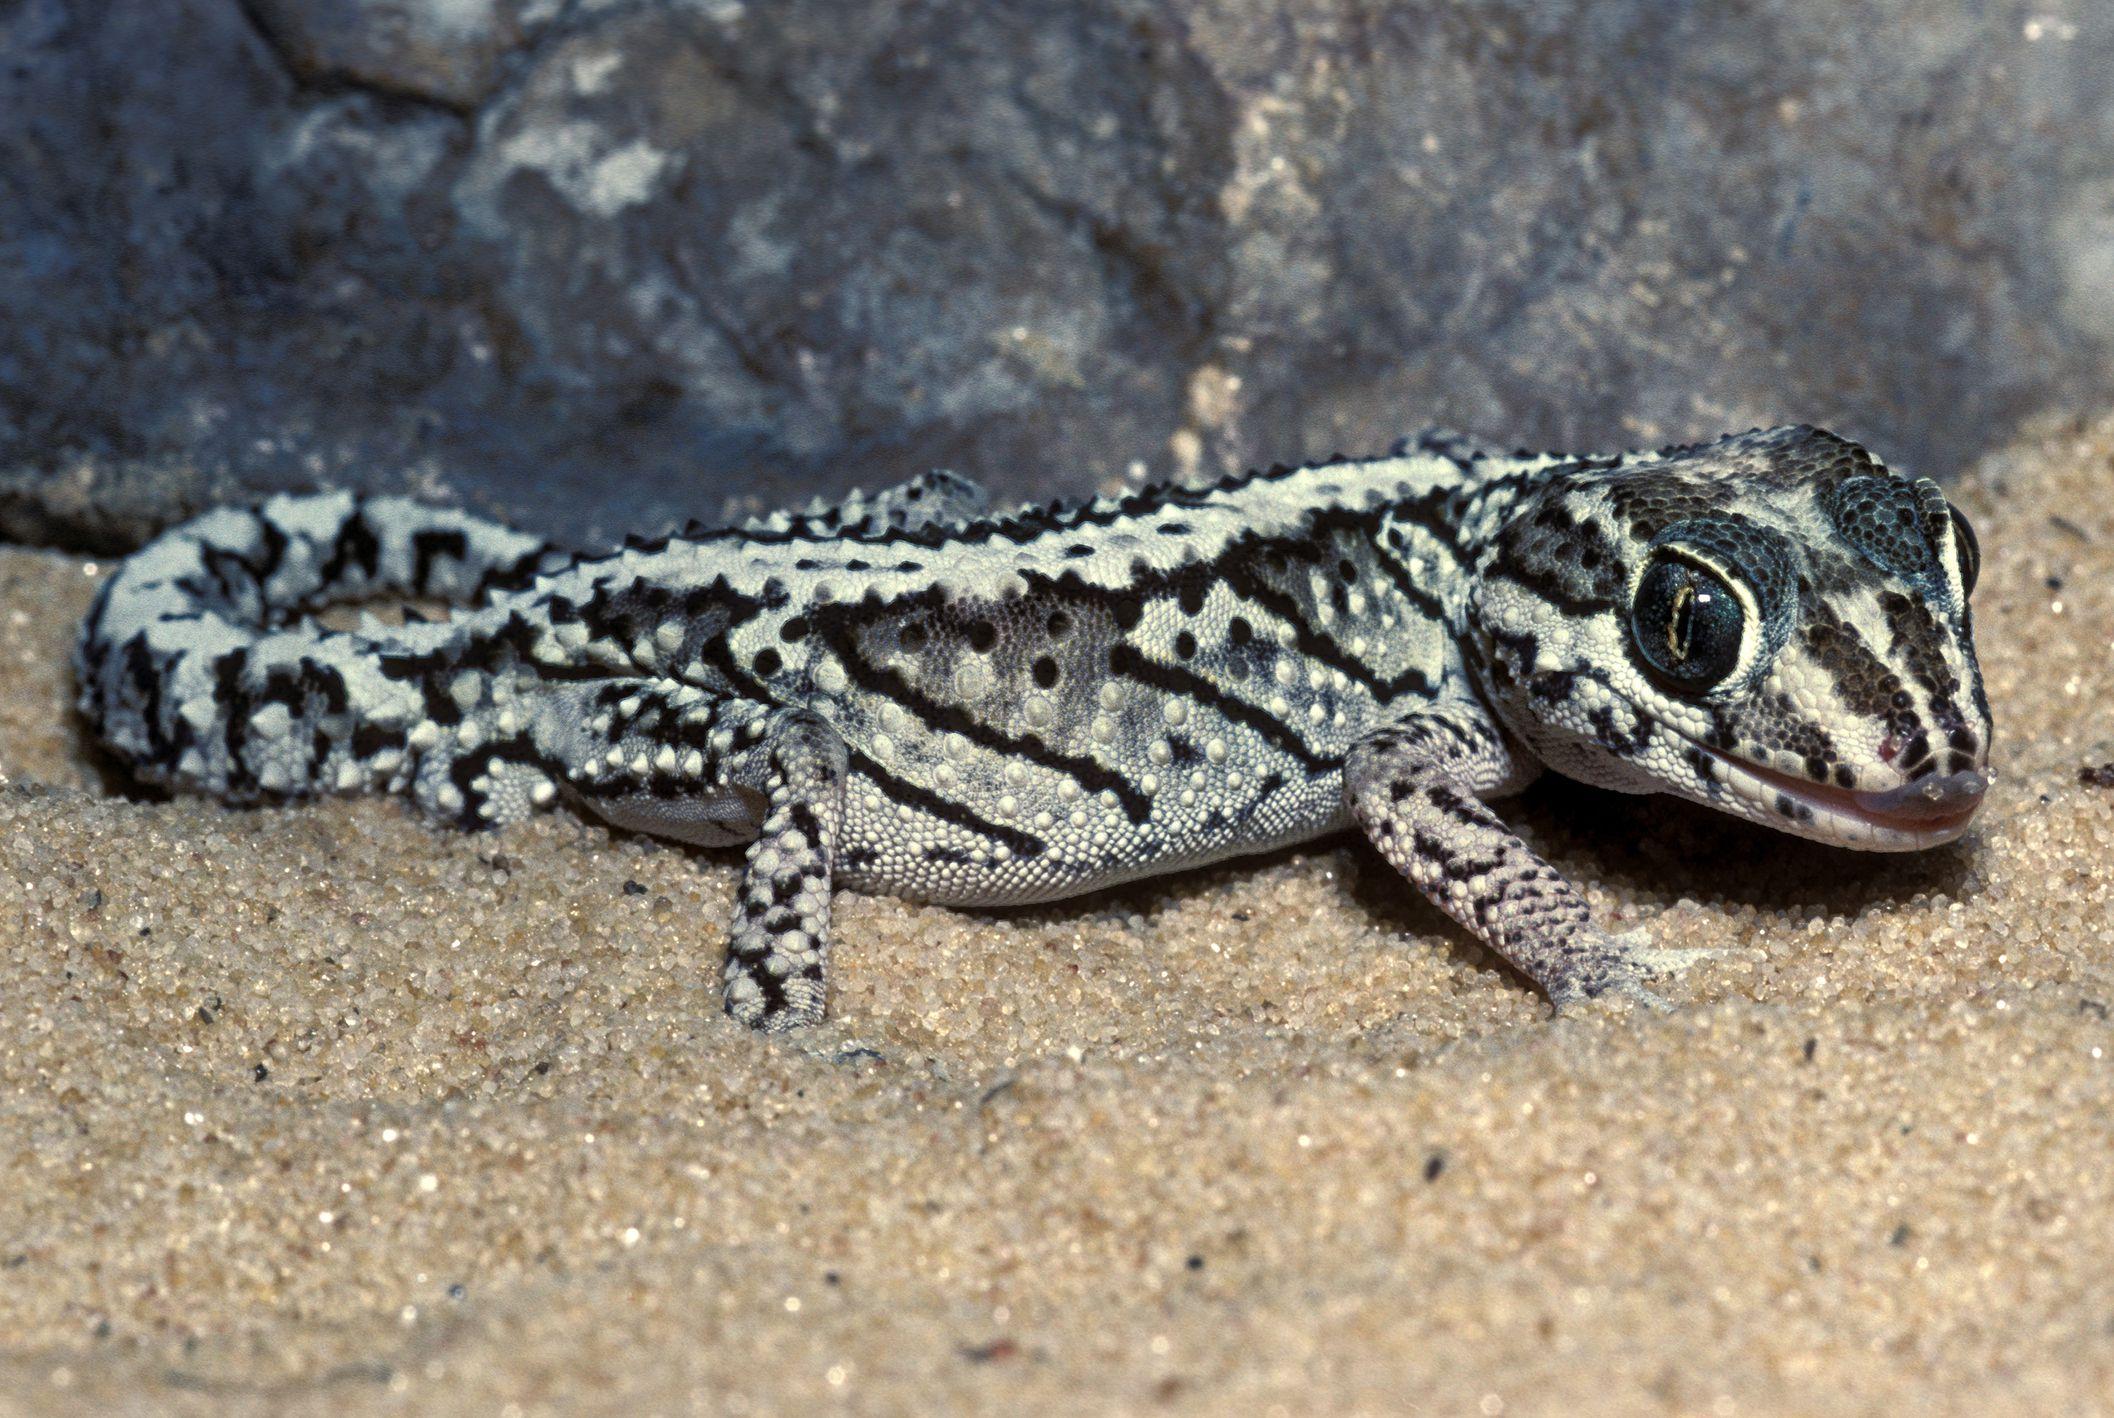 Care of pet common house geckos pet geckos basic care guide to pet panther geckos nvjuhfo Images